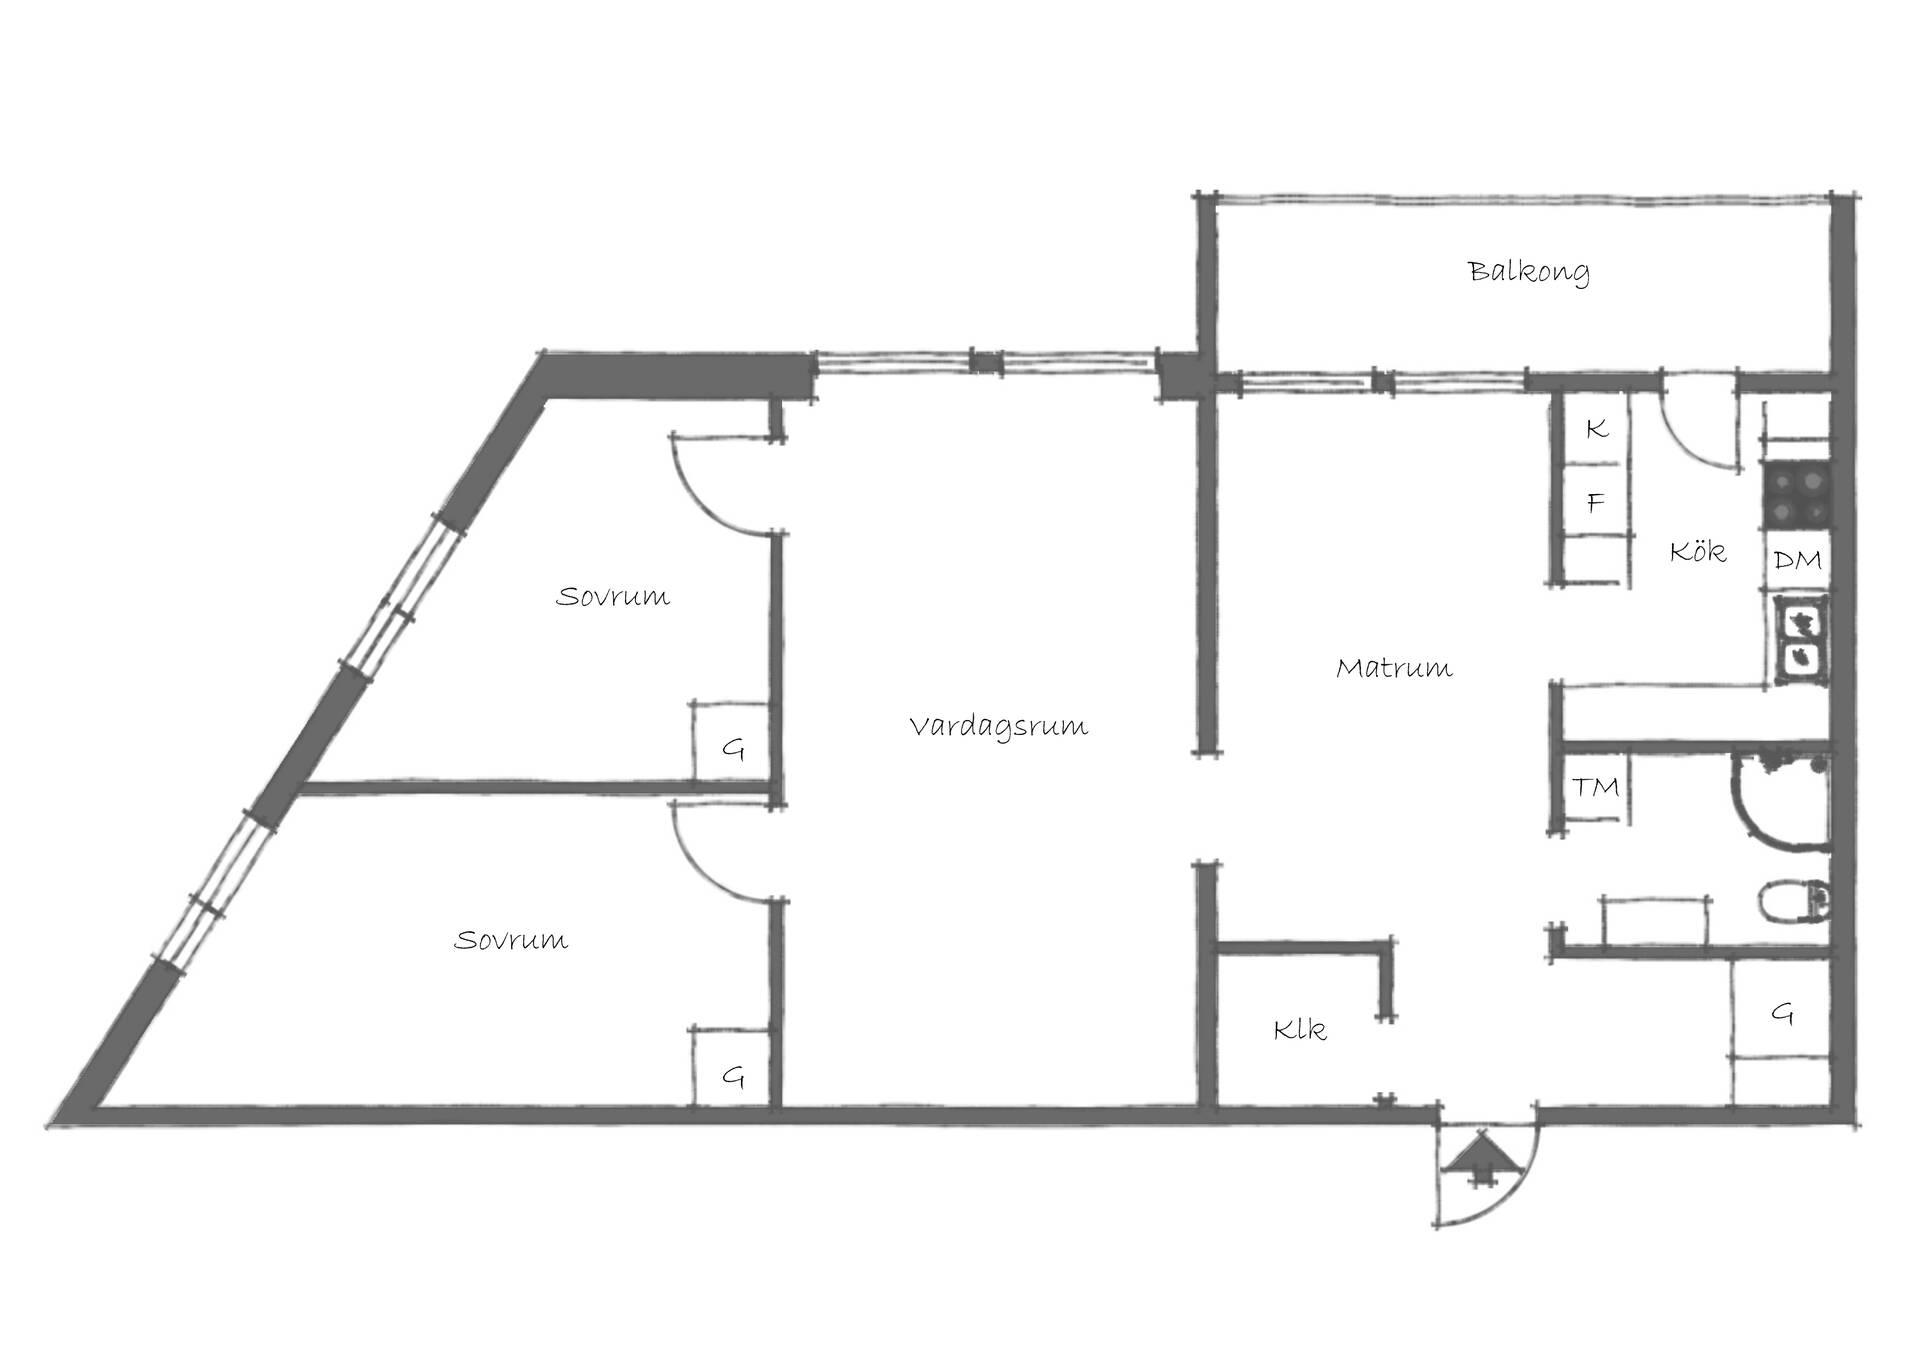 planlösning Karlaplan 21 C